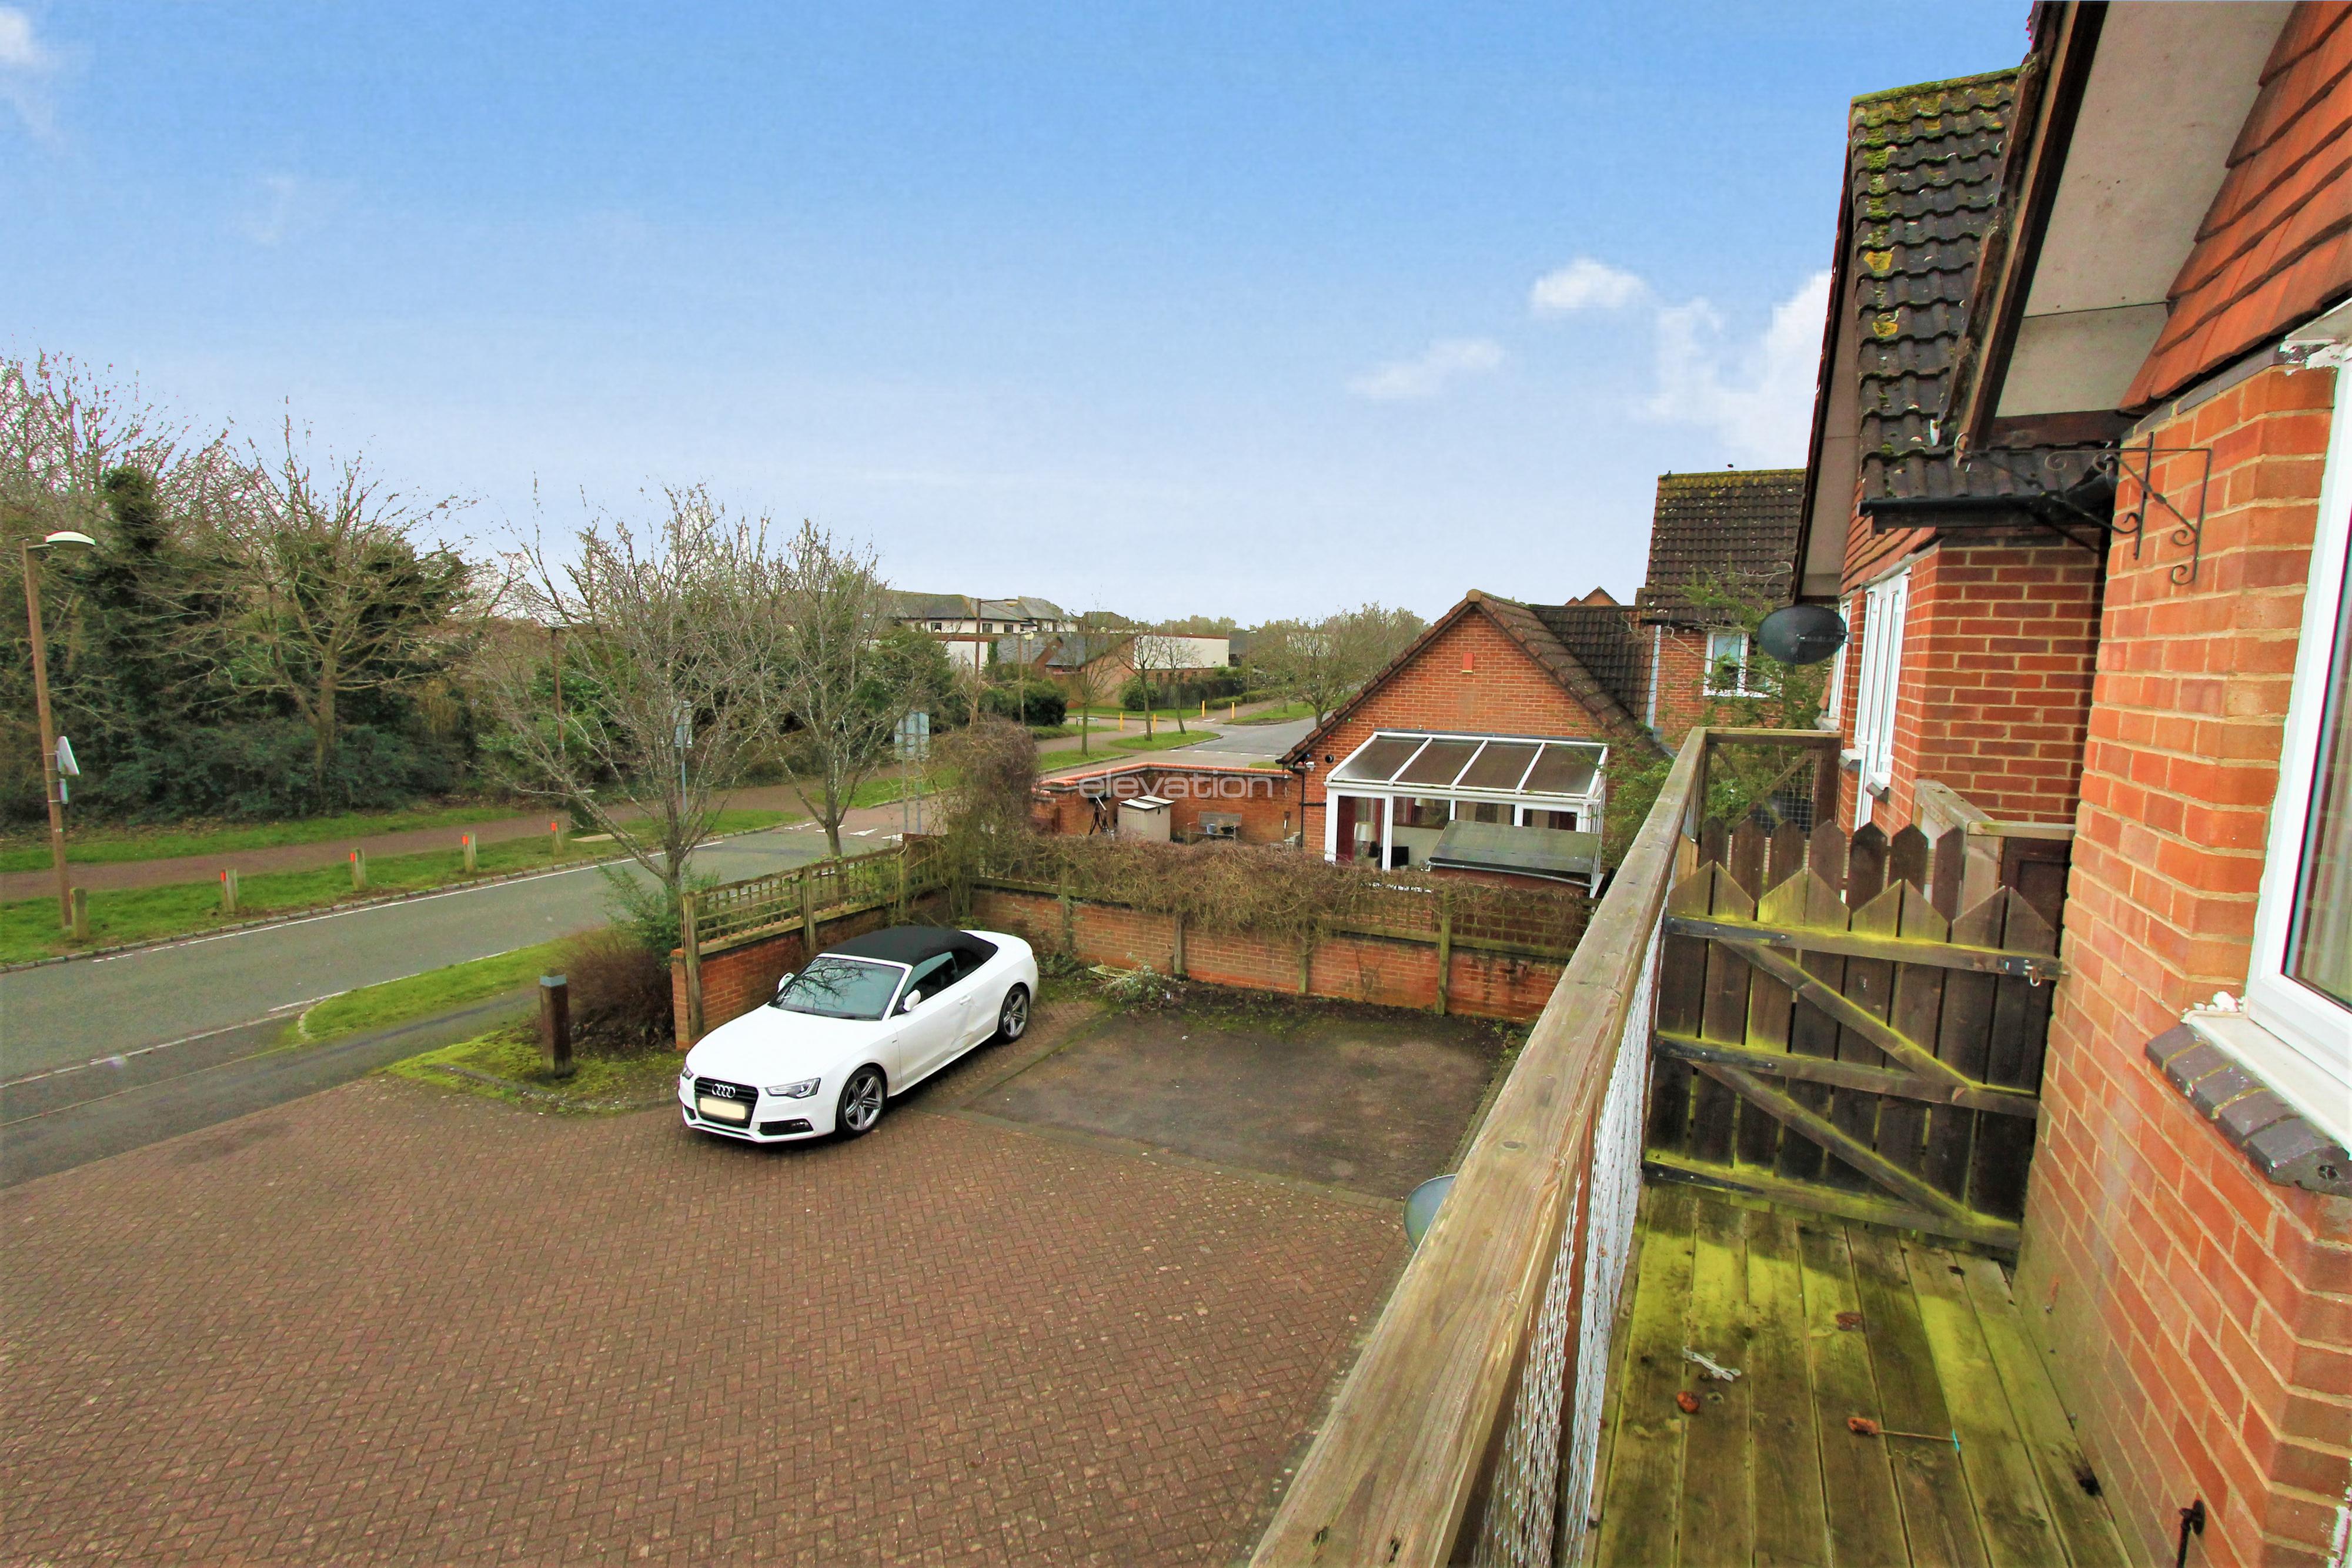 Paynes Drive, Milton Keynes, Buckinghamshire Image